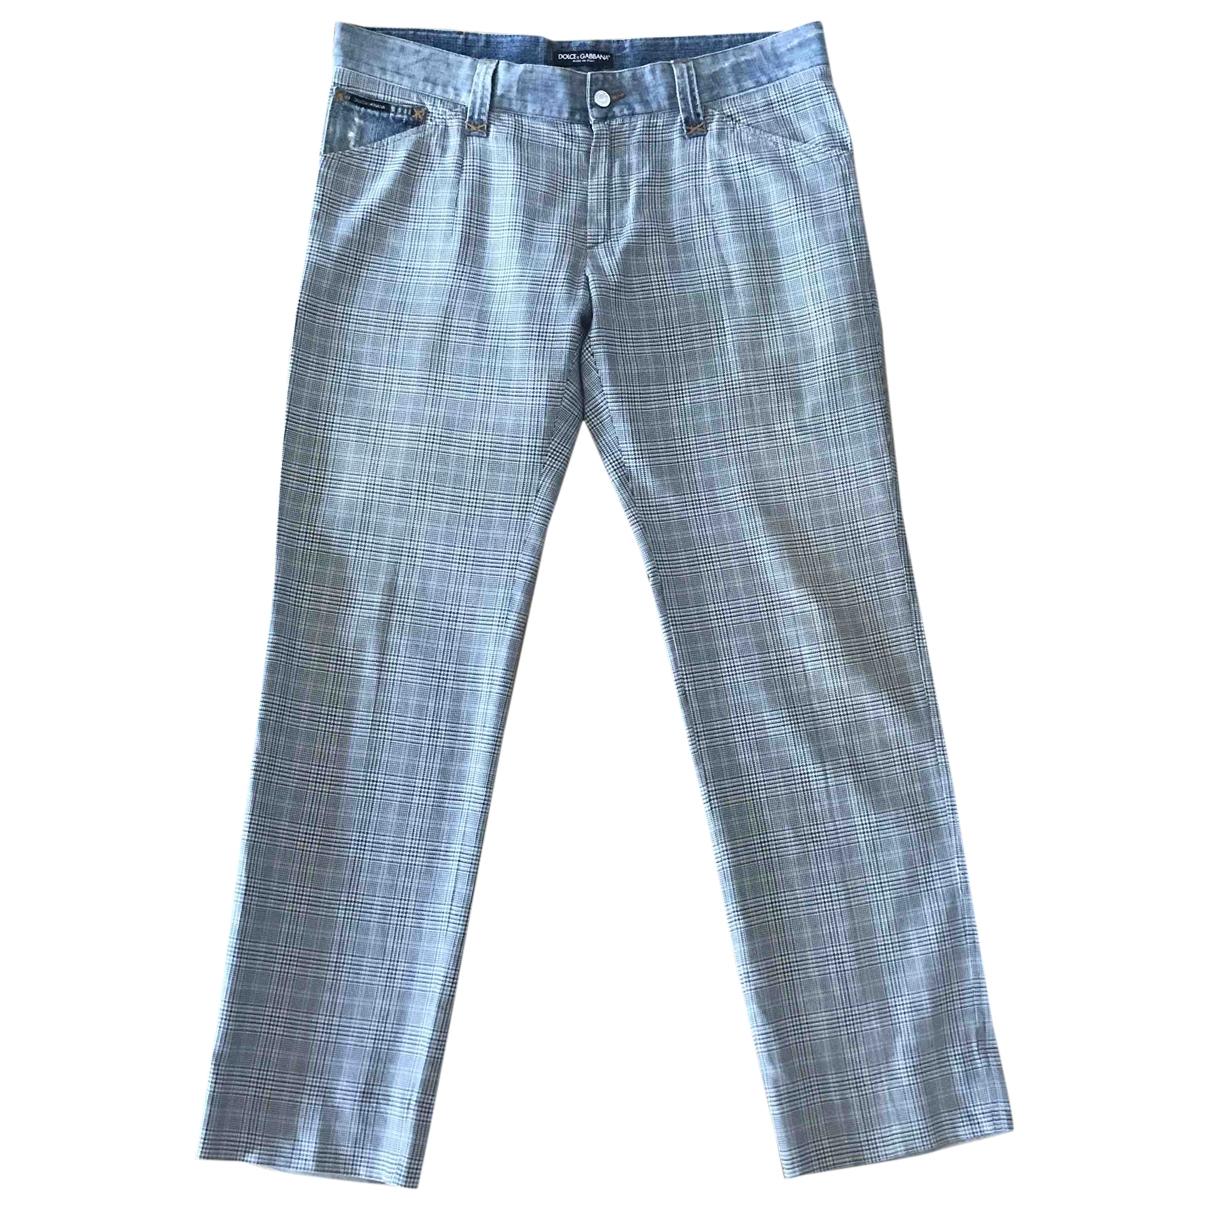 Dolce & Gabbana \N Blue Cotton Trousers for Men 50 IT